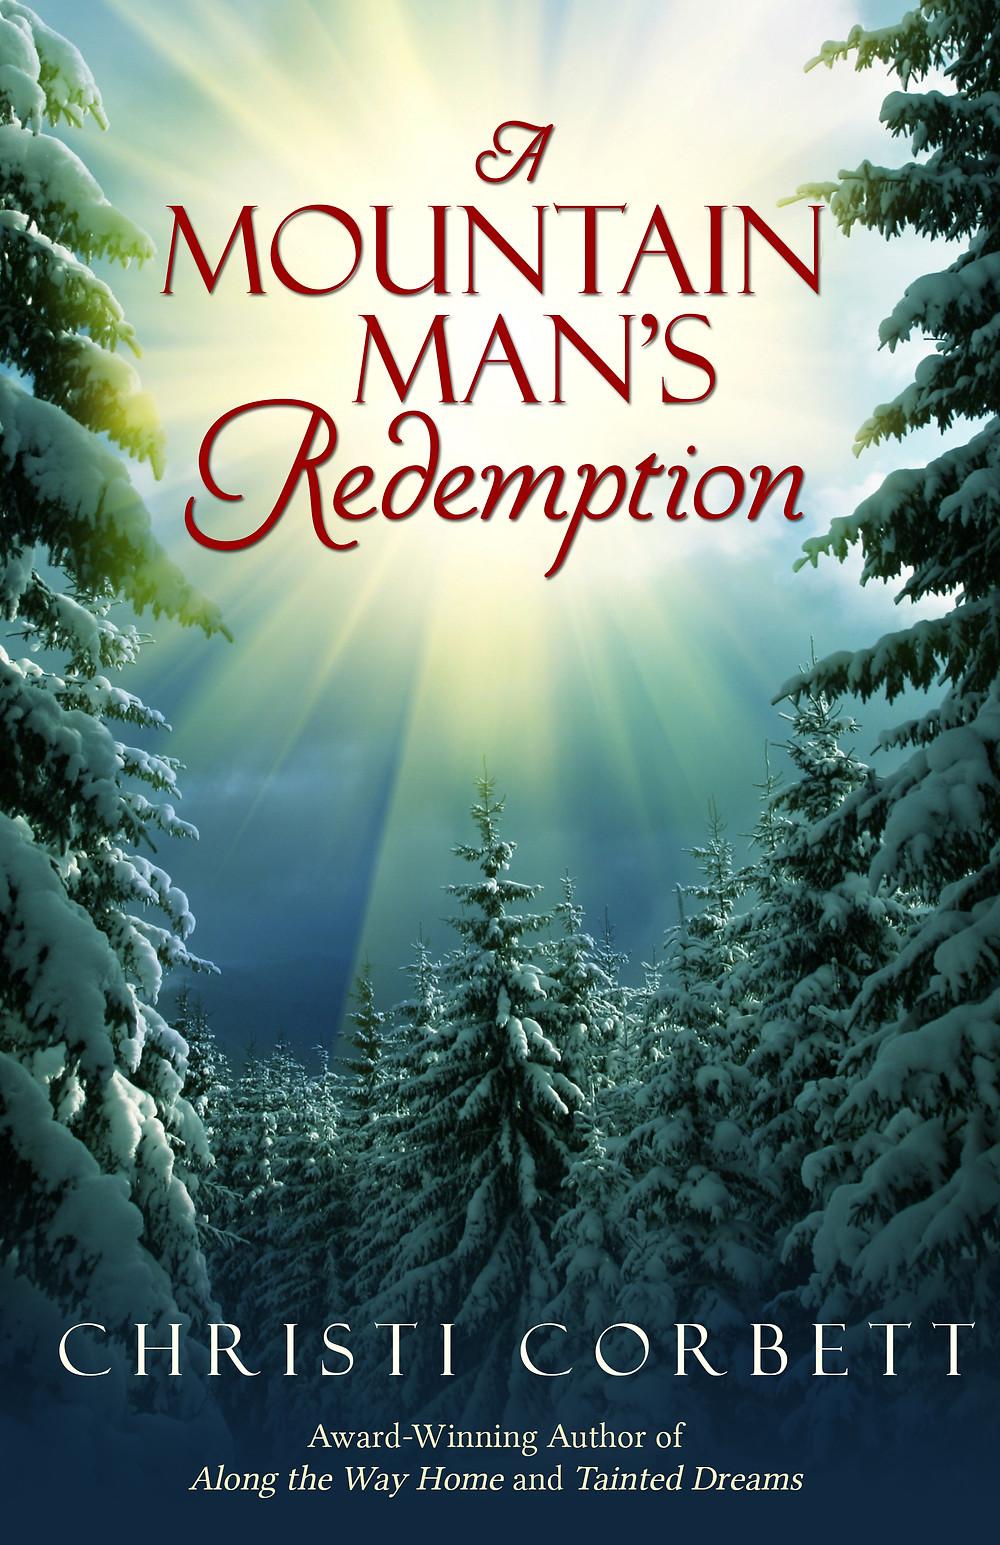 A Mountain Man's Redemption by Christi Corbett